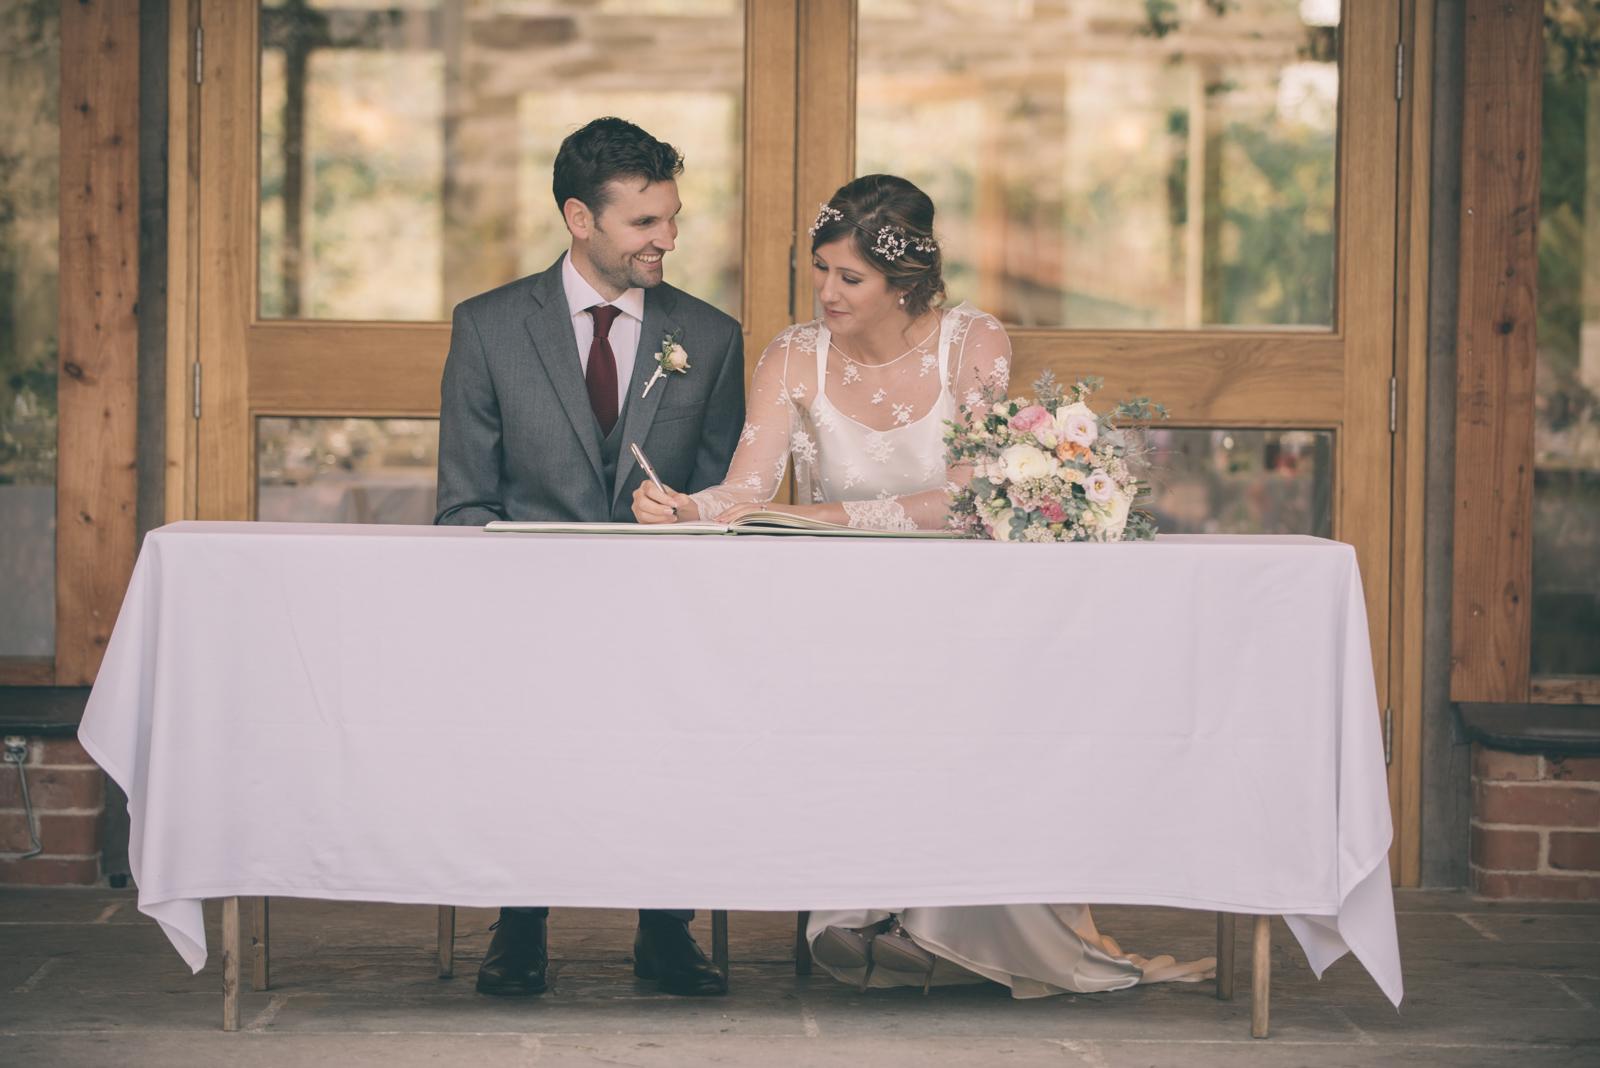 nancarrow-wedding-photography-71.jpg